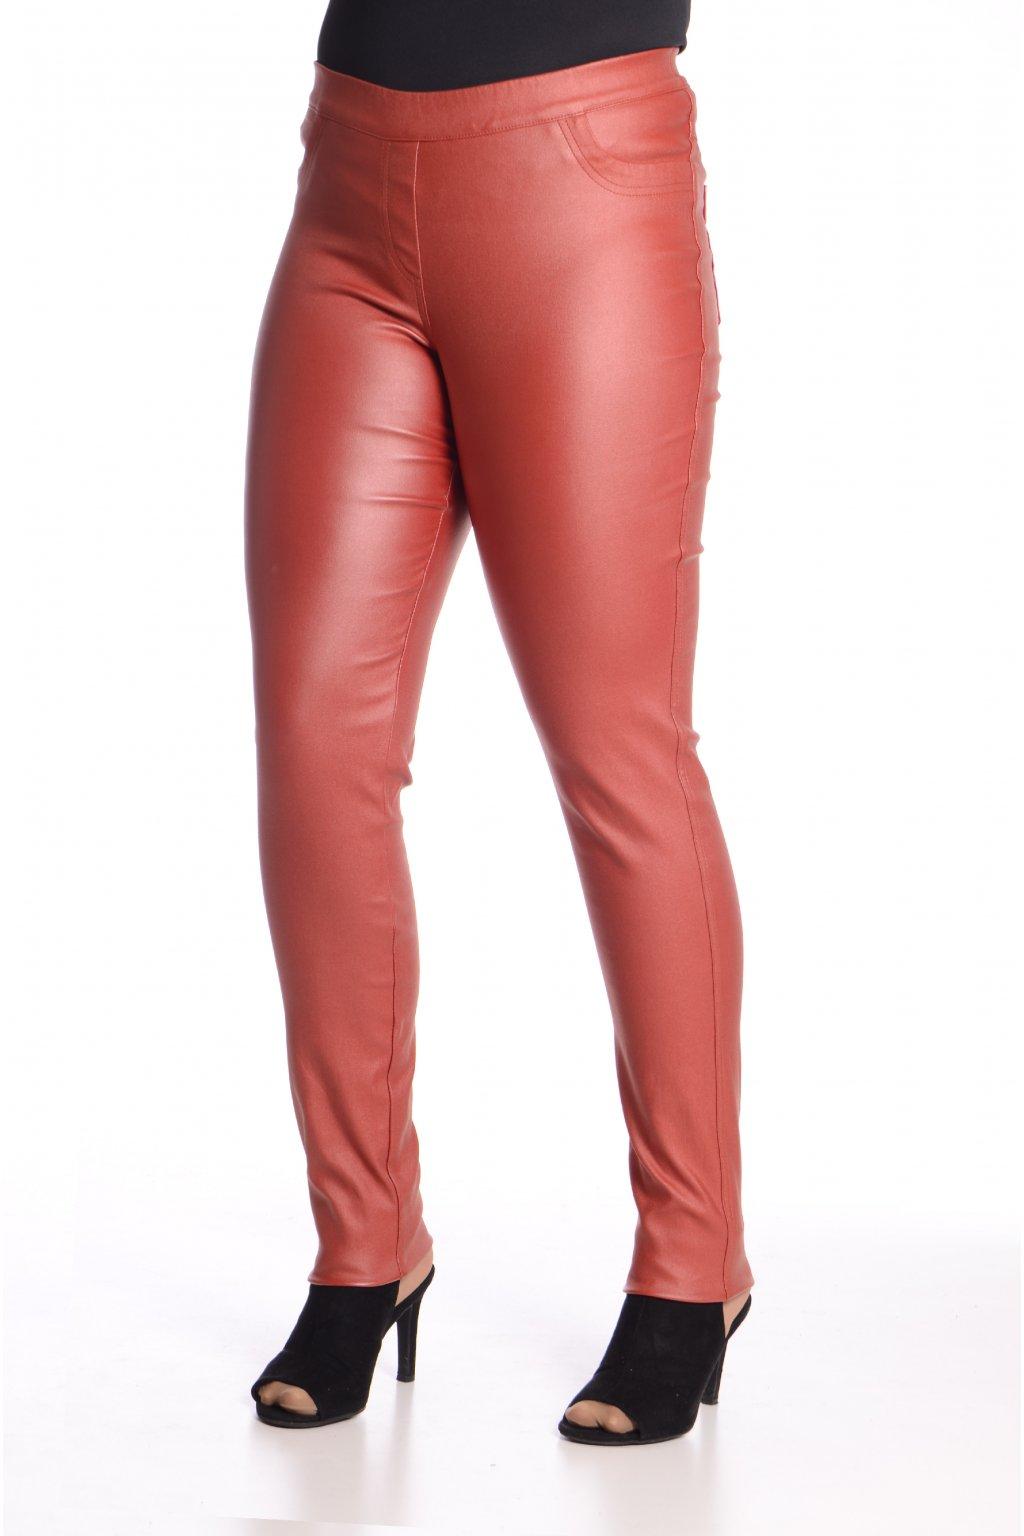 64T Kalhoty koženka cihlová o142 (1)